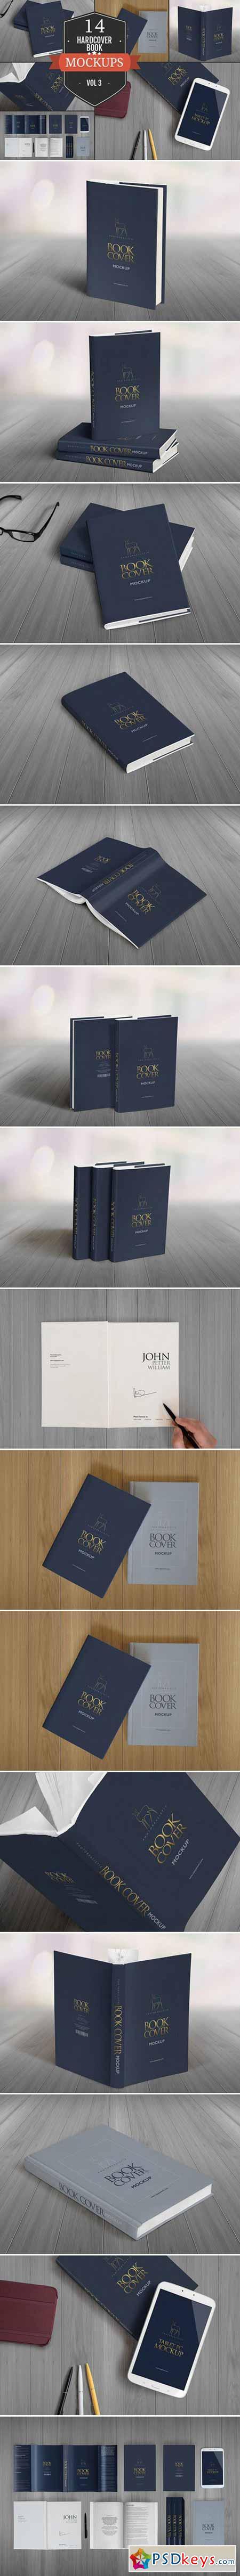 Elegant Hardcover Book Mockups Vol.3 390112